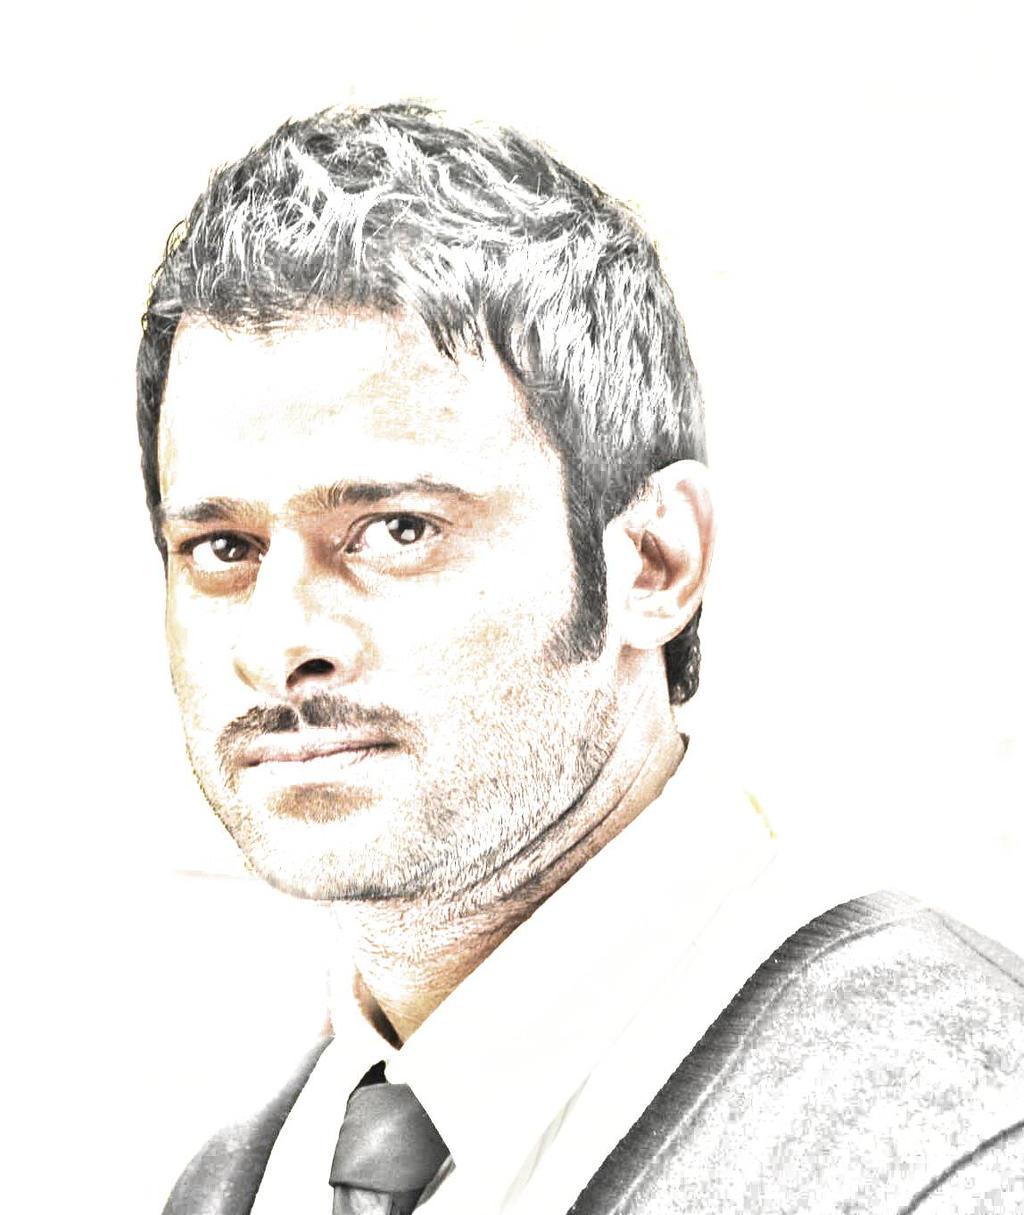 Prabhas Pencil Sketch Foto 4 By Sumanth0019 On DeviantArt